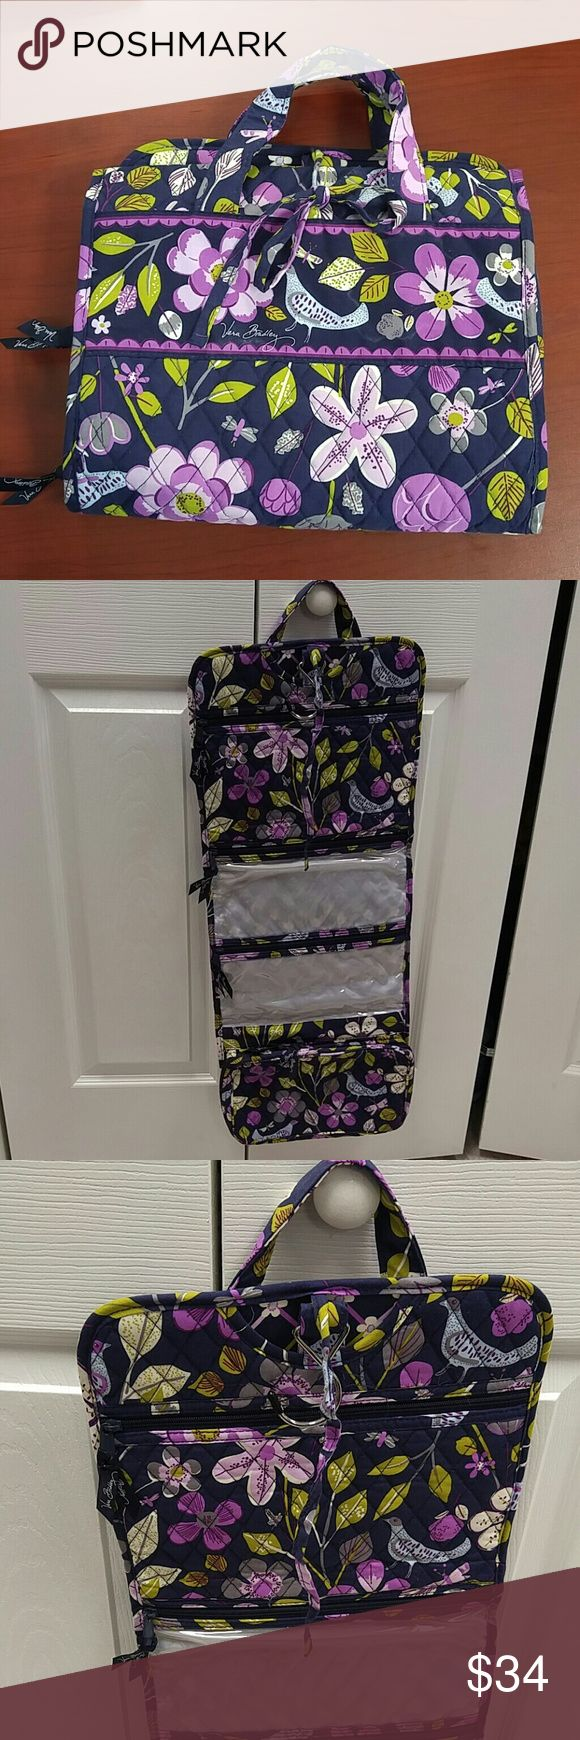 Vera bradley Travel Accessory bag Excellent and new condition Vera Bradley Bags Travel Bags